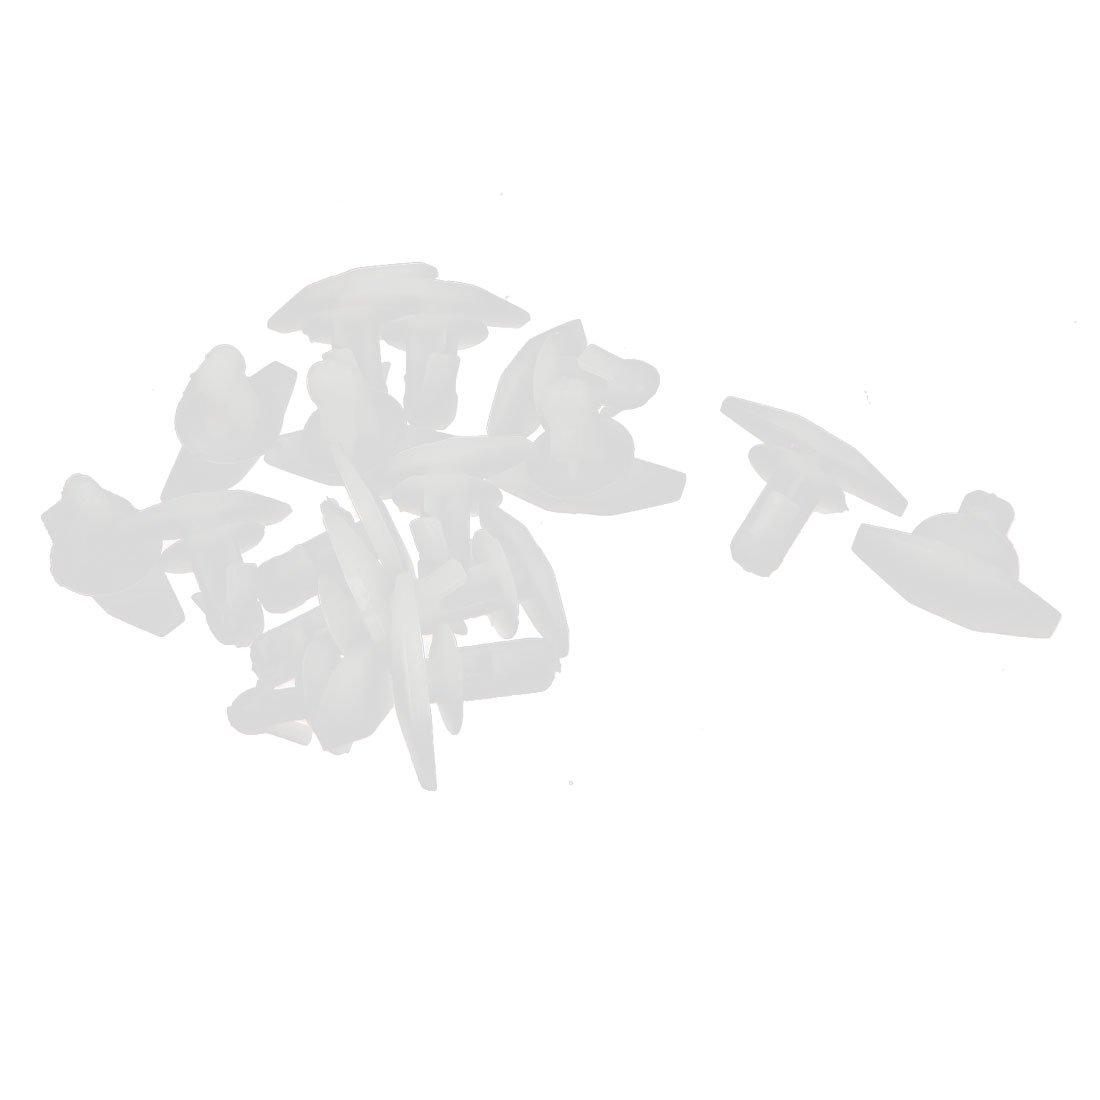 16 Pz bianco plastica rivetti fermo gancetto 4mm x 6mm x 8mm per macchina paraurti parafango